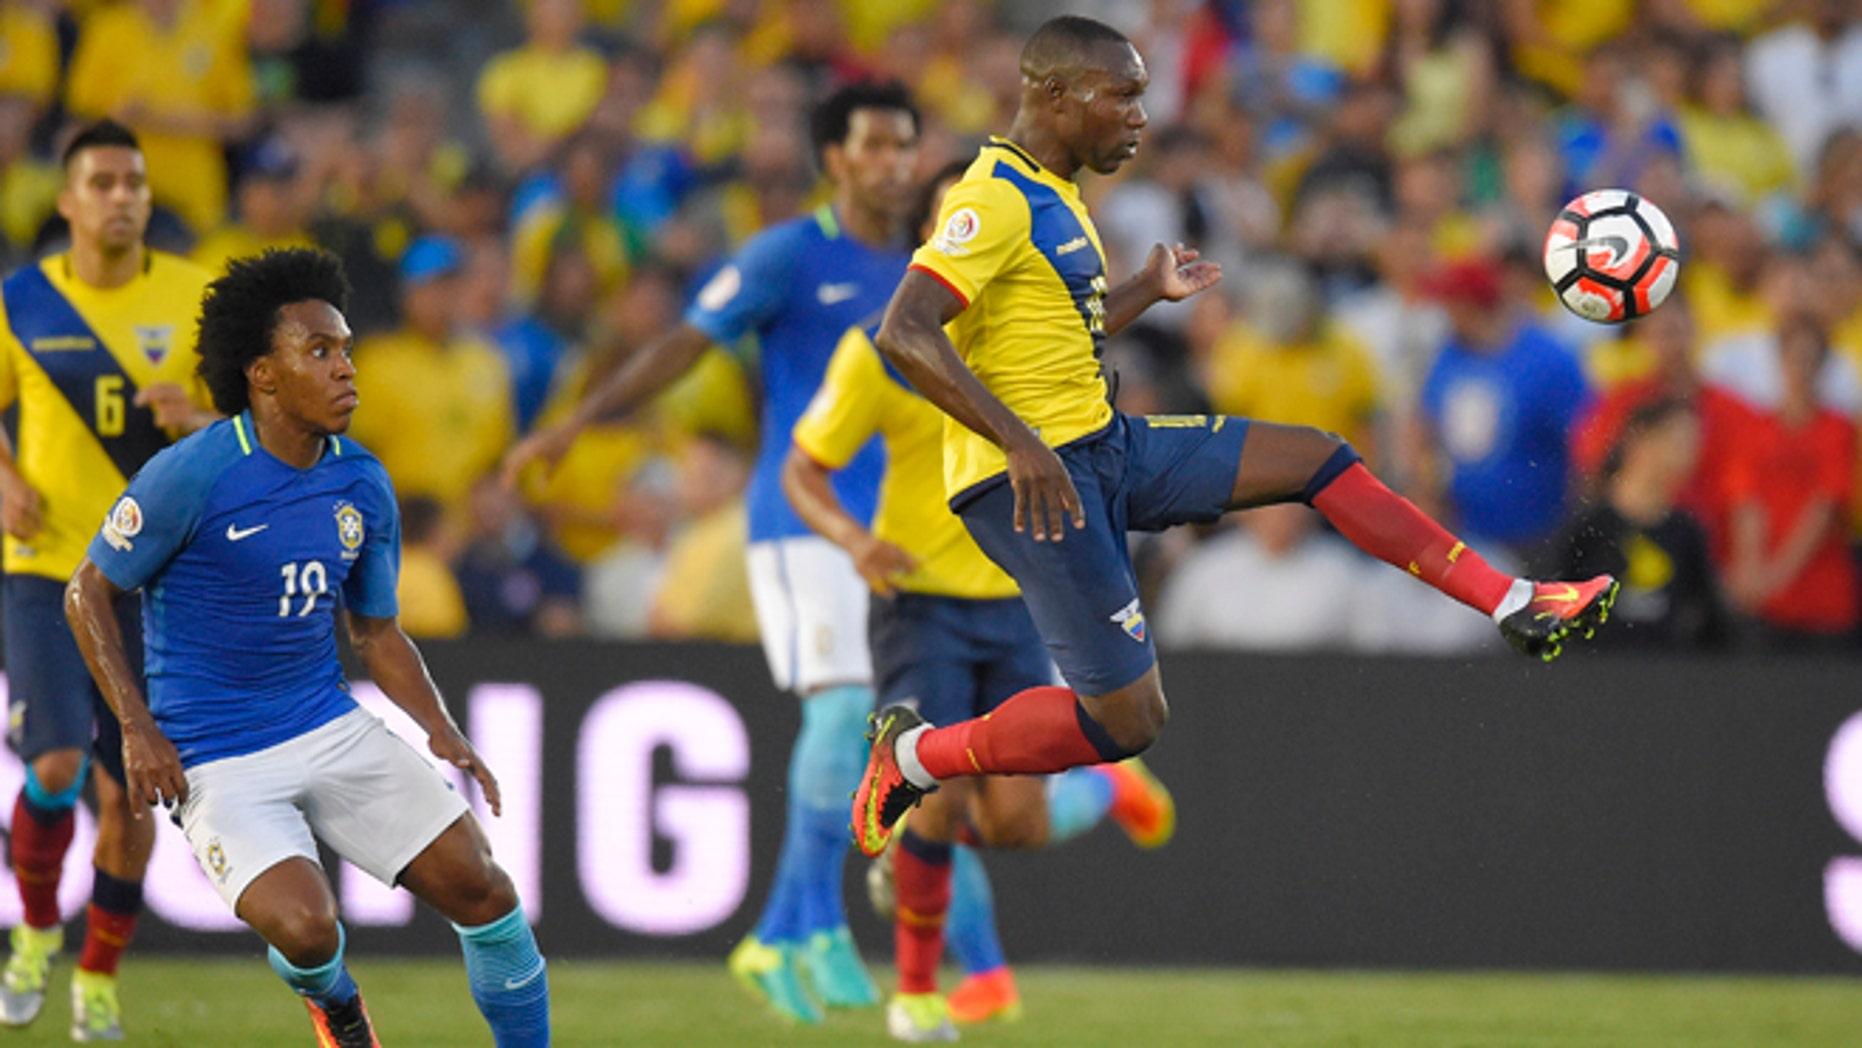 Ecuador midfielder Walter Ayovi, right, kicks the ball as Brazil midfielder Willian, left, watches during a Copa America group B soccer match at the Rose Bowl, Saturday, June 4, 2016, in Pasadena, Calif. (AP Photo/Mark J. Terrill)